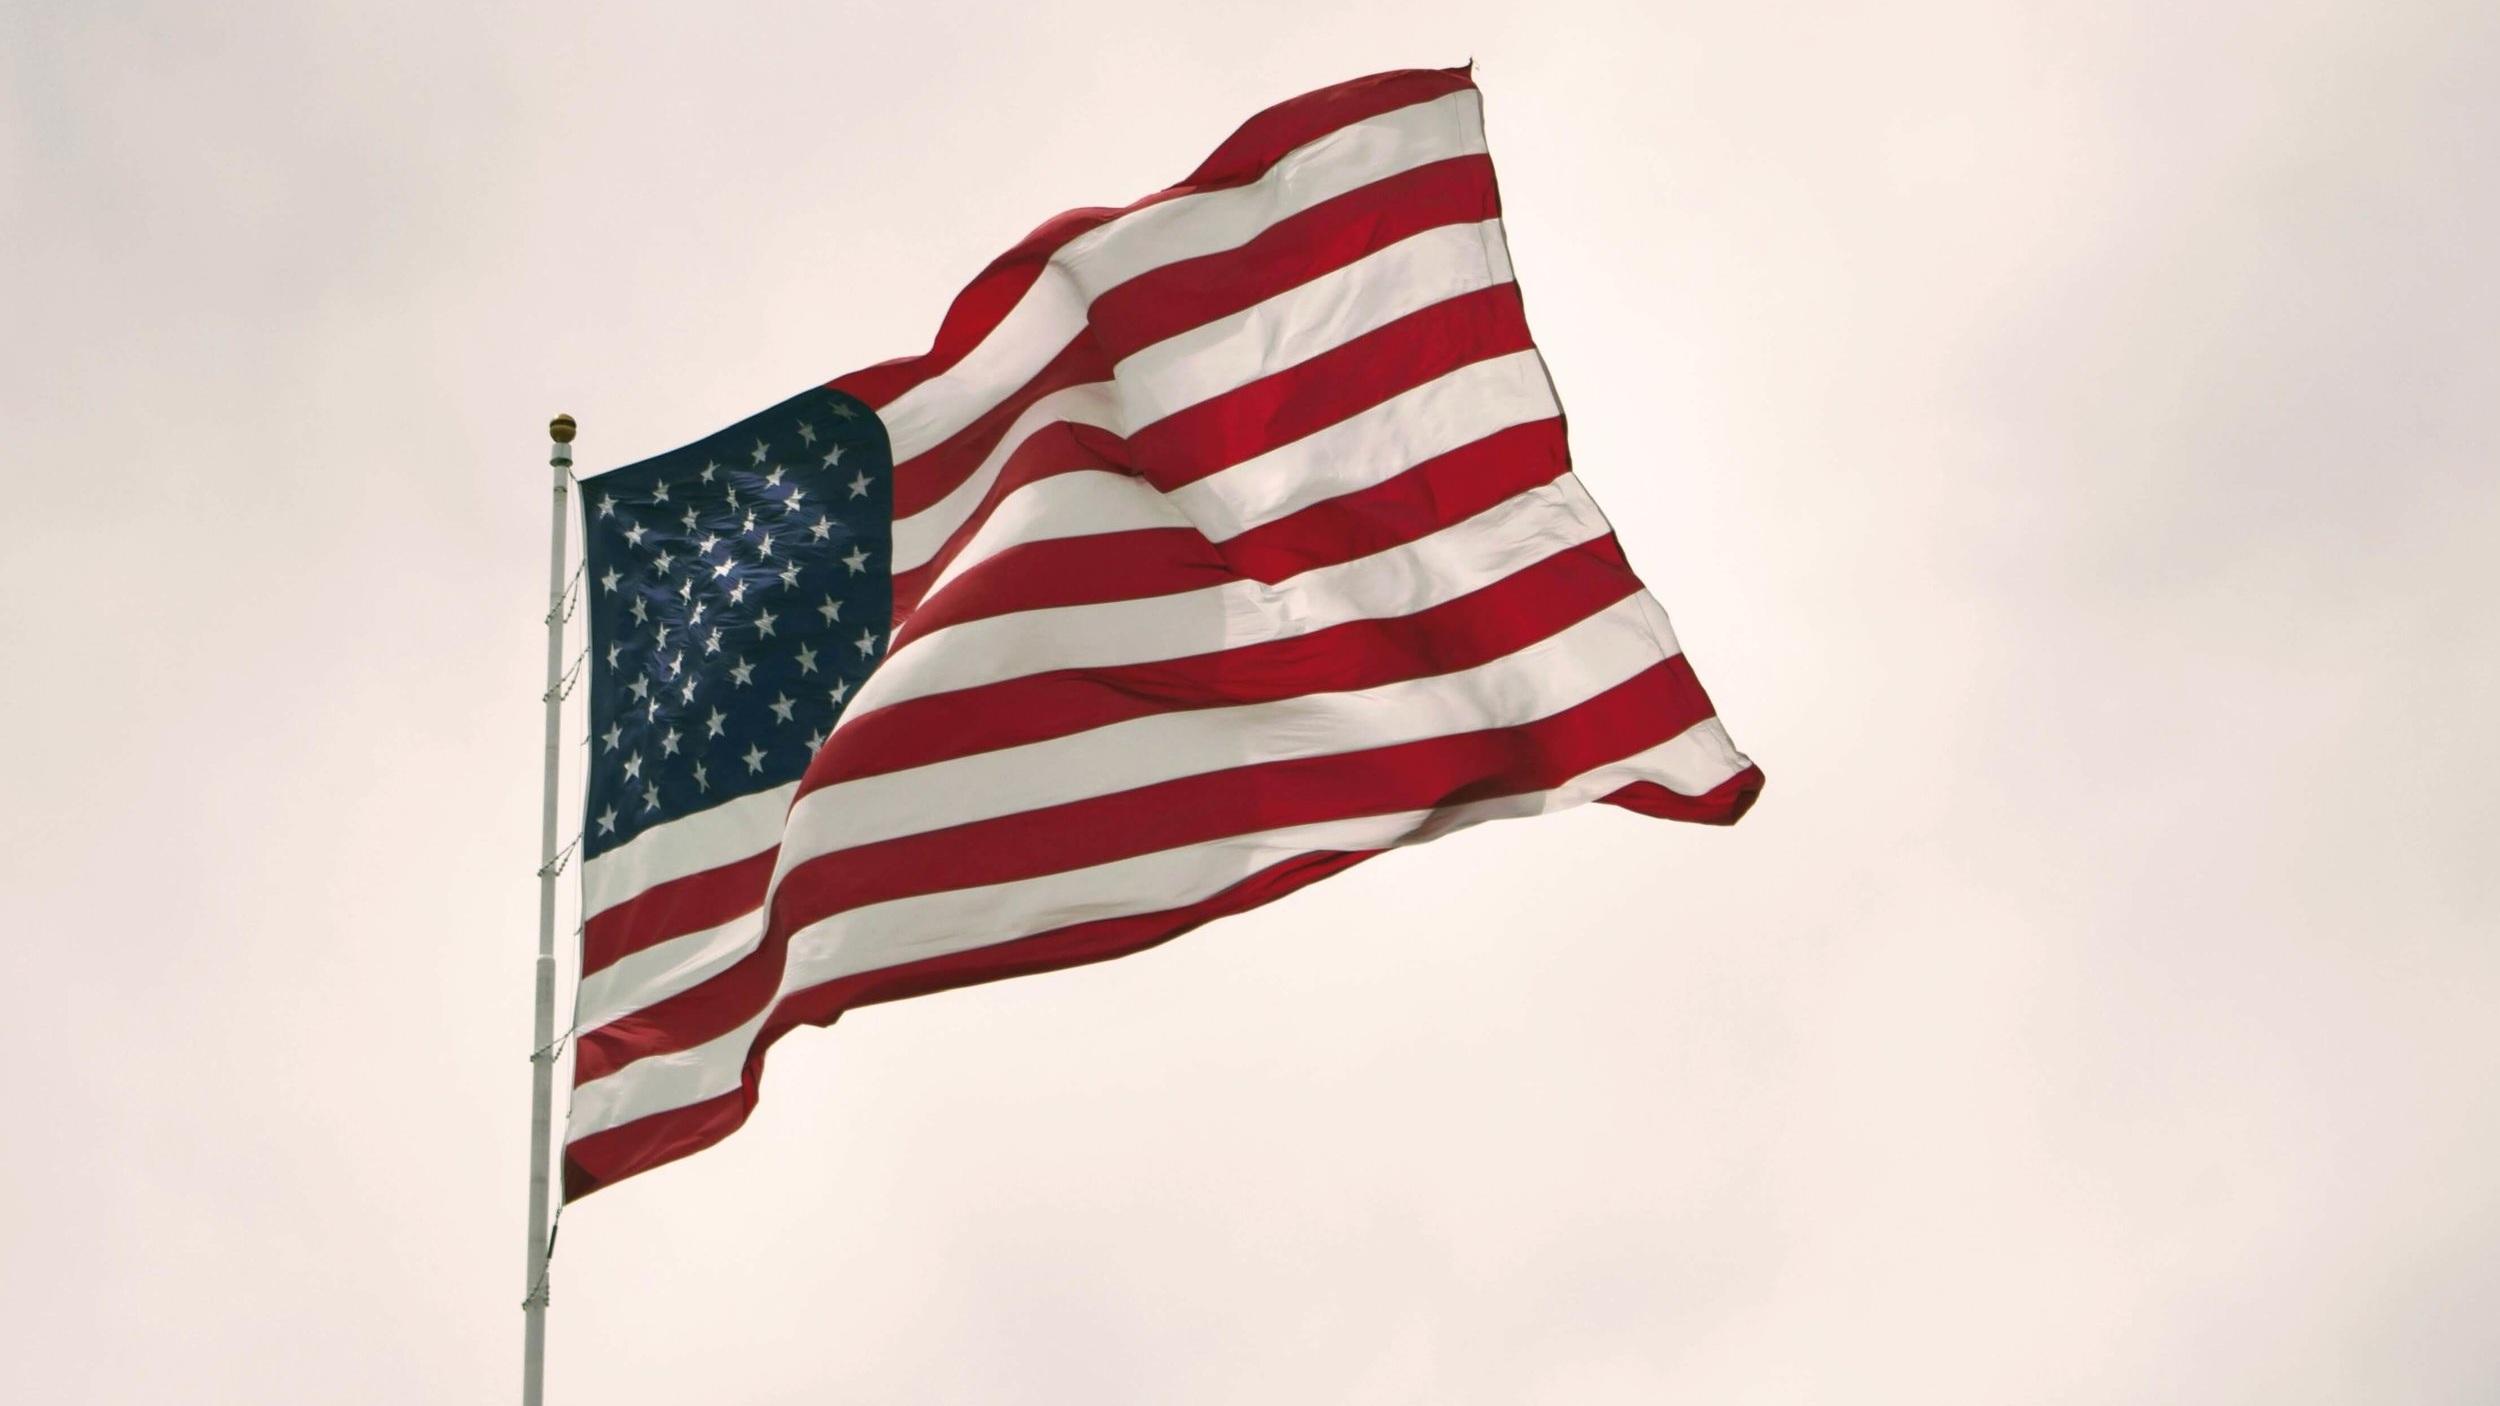 Susan-Carroll-Law_Family-Law-Divorce-Seattle_First-Ammendment-American-Flag-Joshua-Hoehne-635782-web.jpg